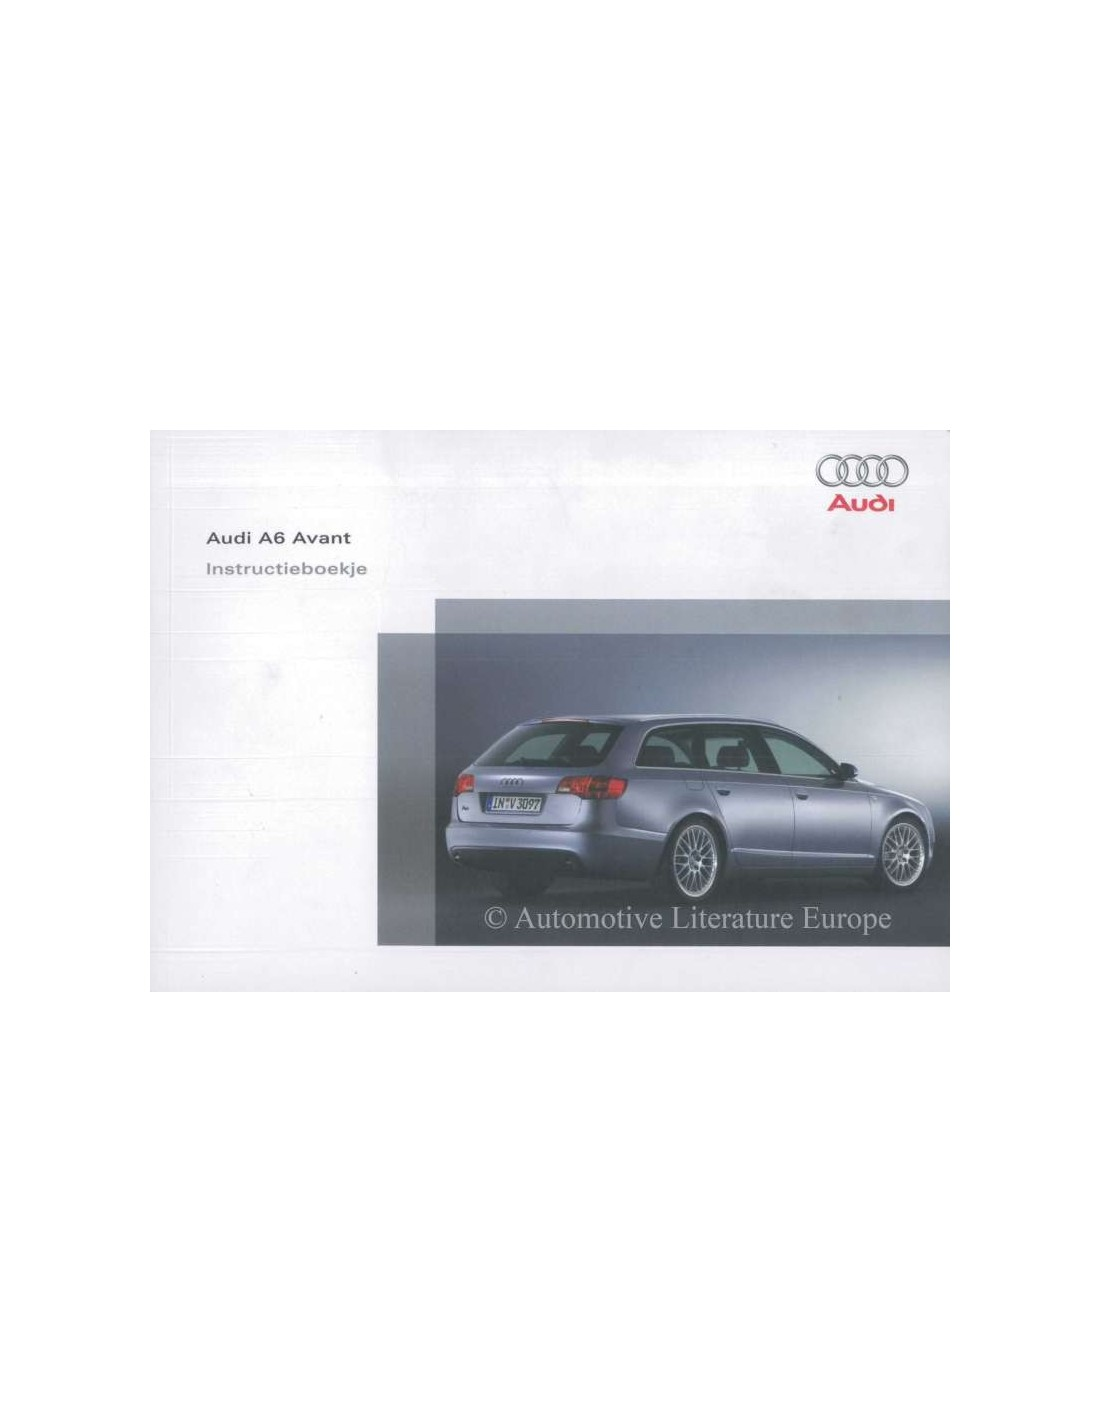 2006 audi a6 avant owners manual dutch rh autolit eu audi a6 c5 car manual Audi A6 Manual PDF